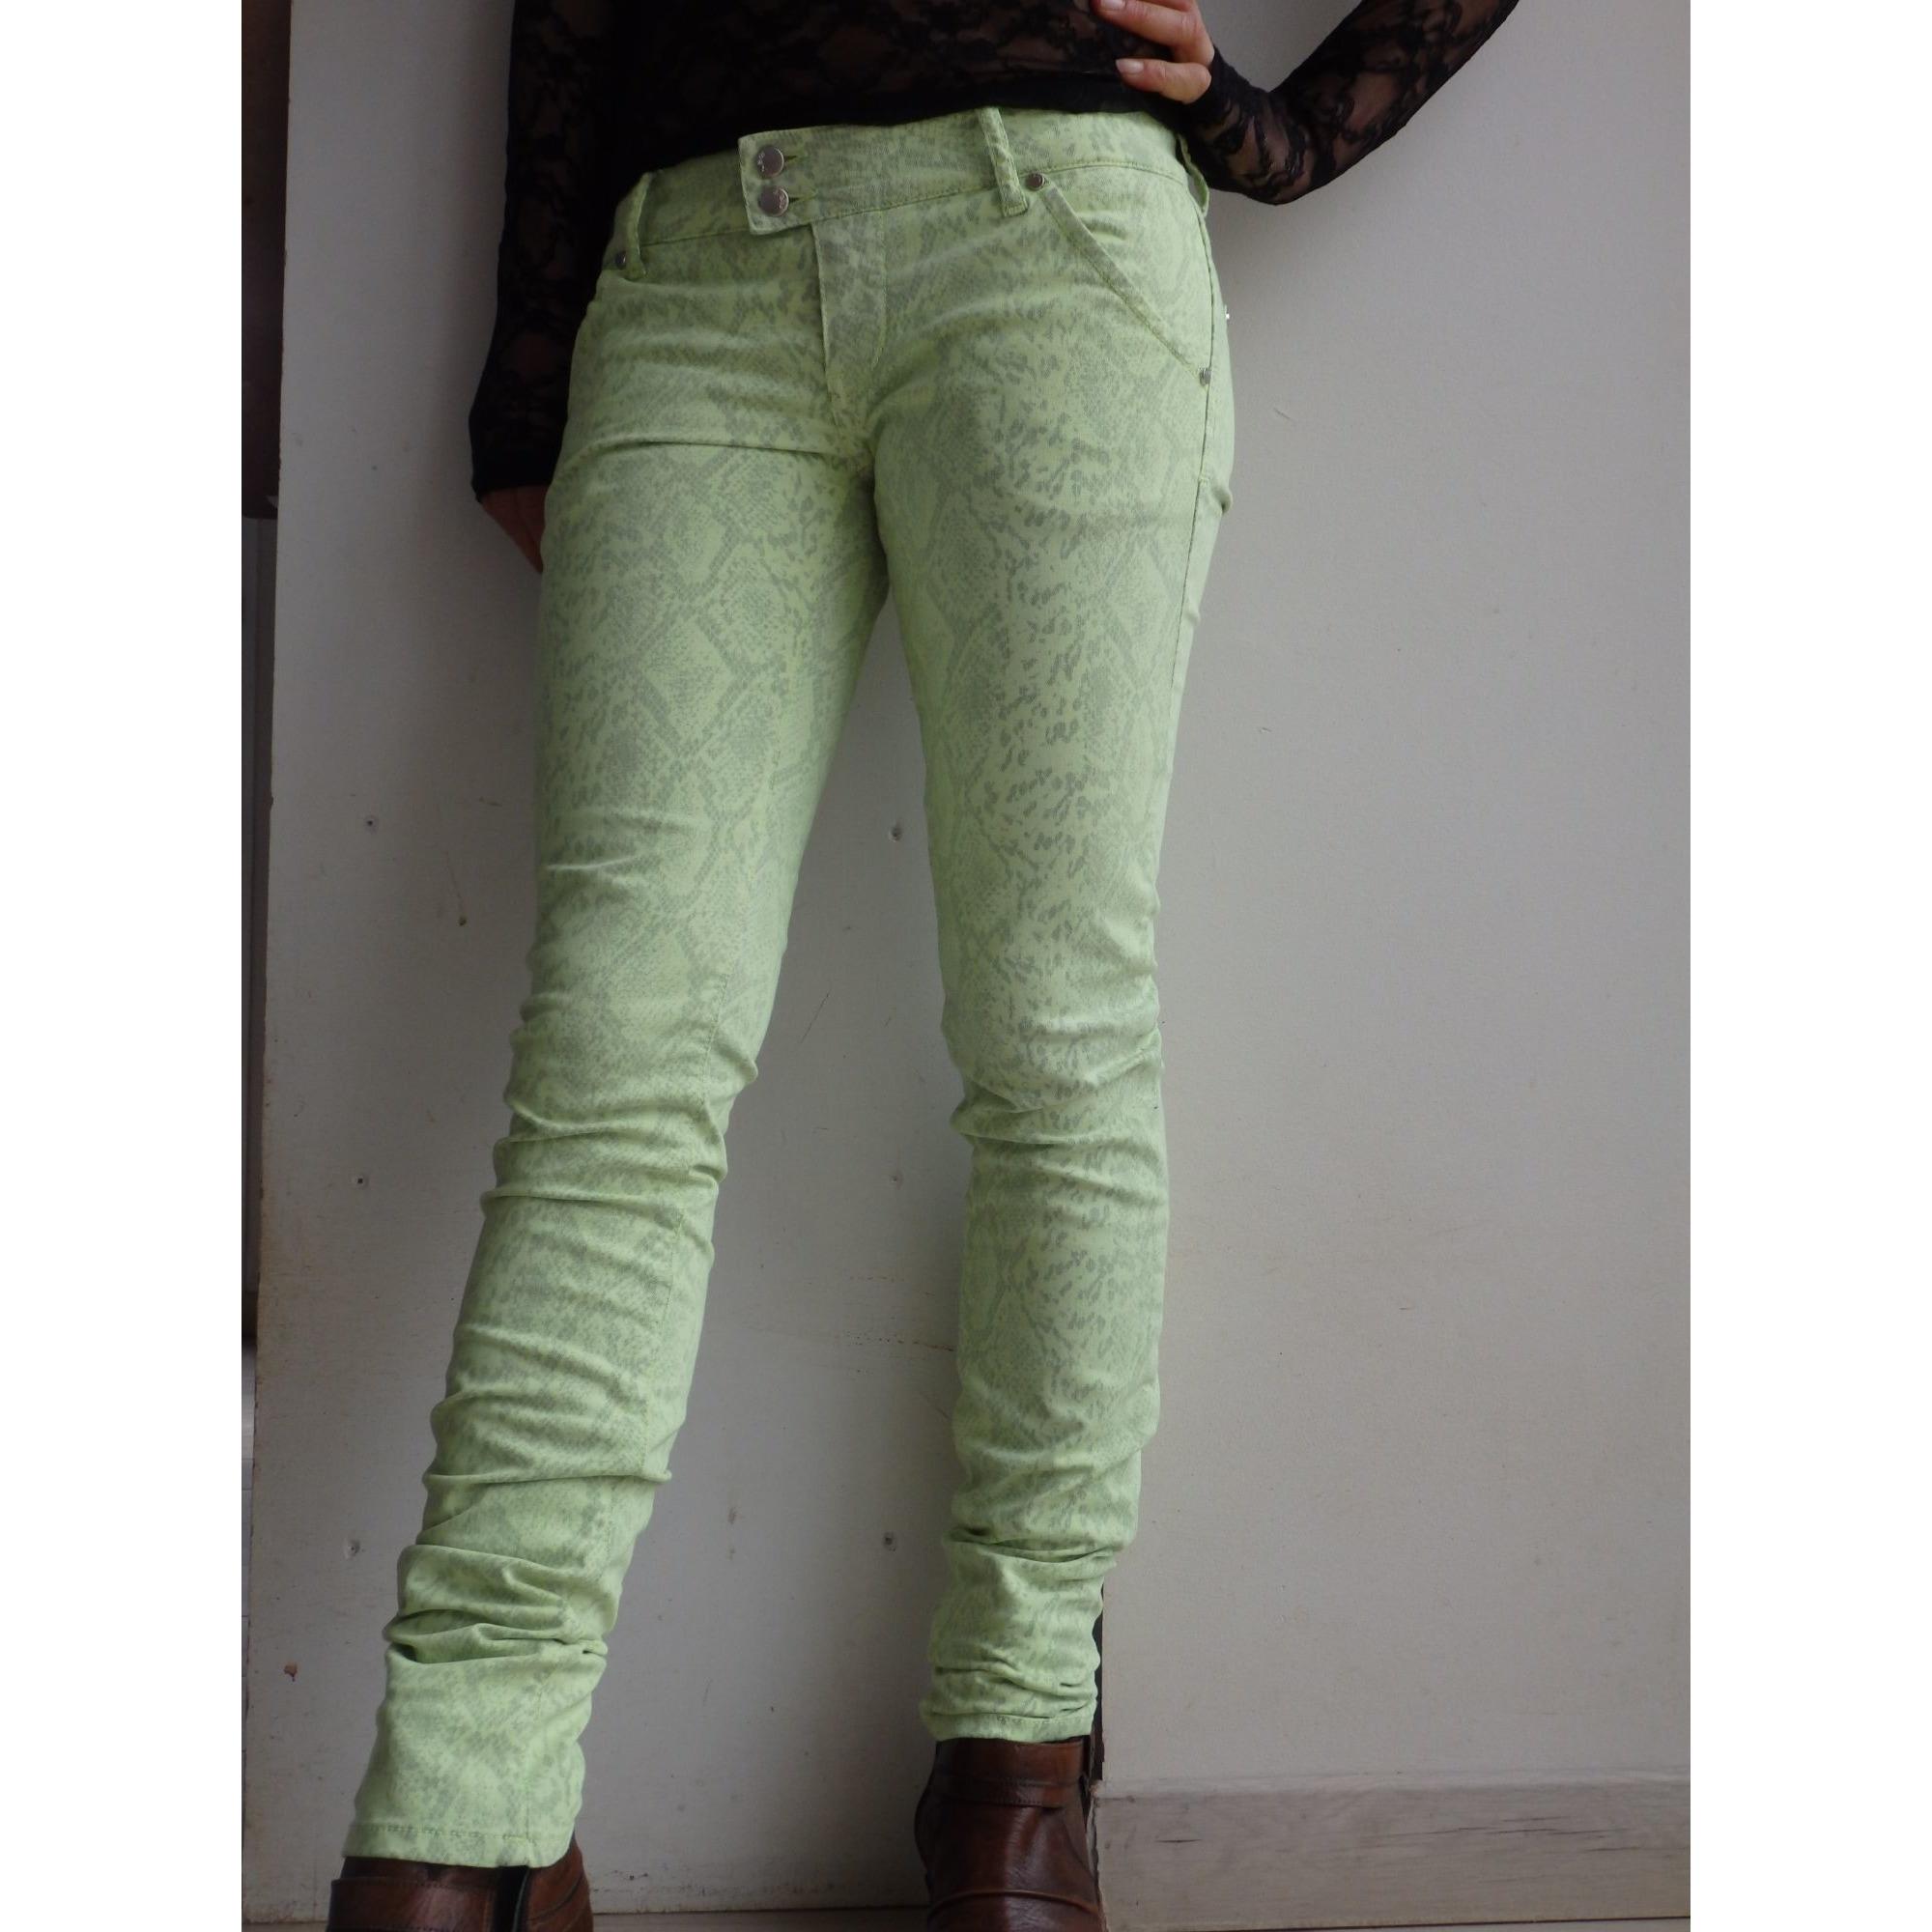 Jeans slim MET Imprimés animaliers